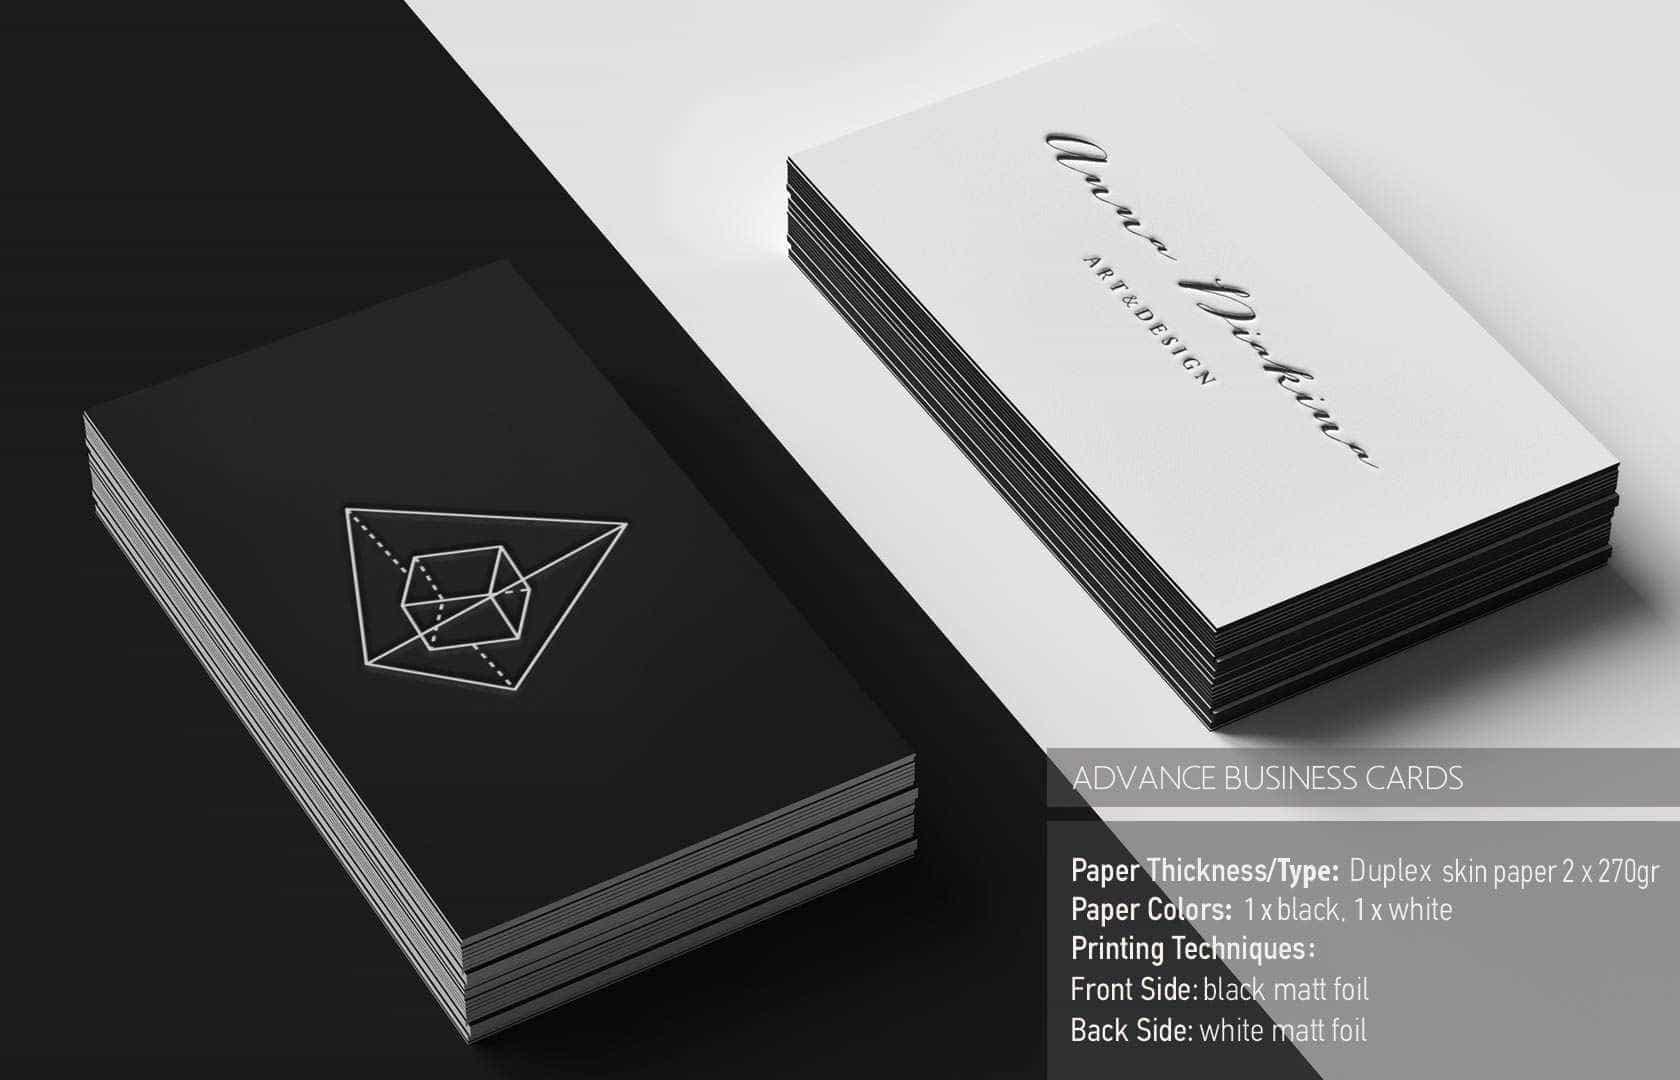 duplex matt black white paper perakis 3.39.471 271 320 2.28.920 50papago min